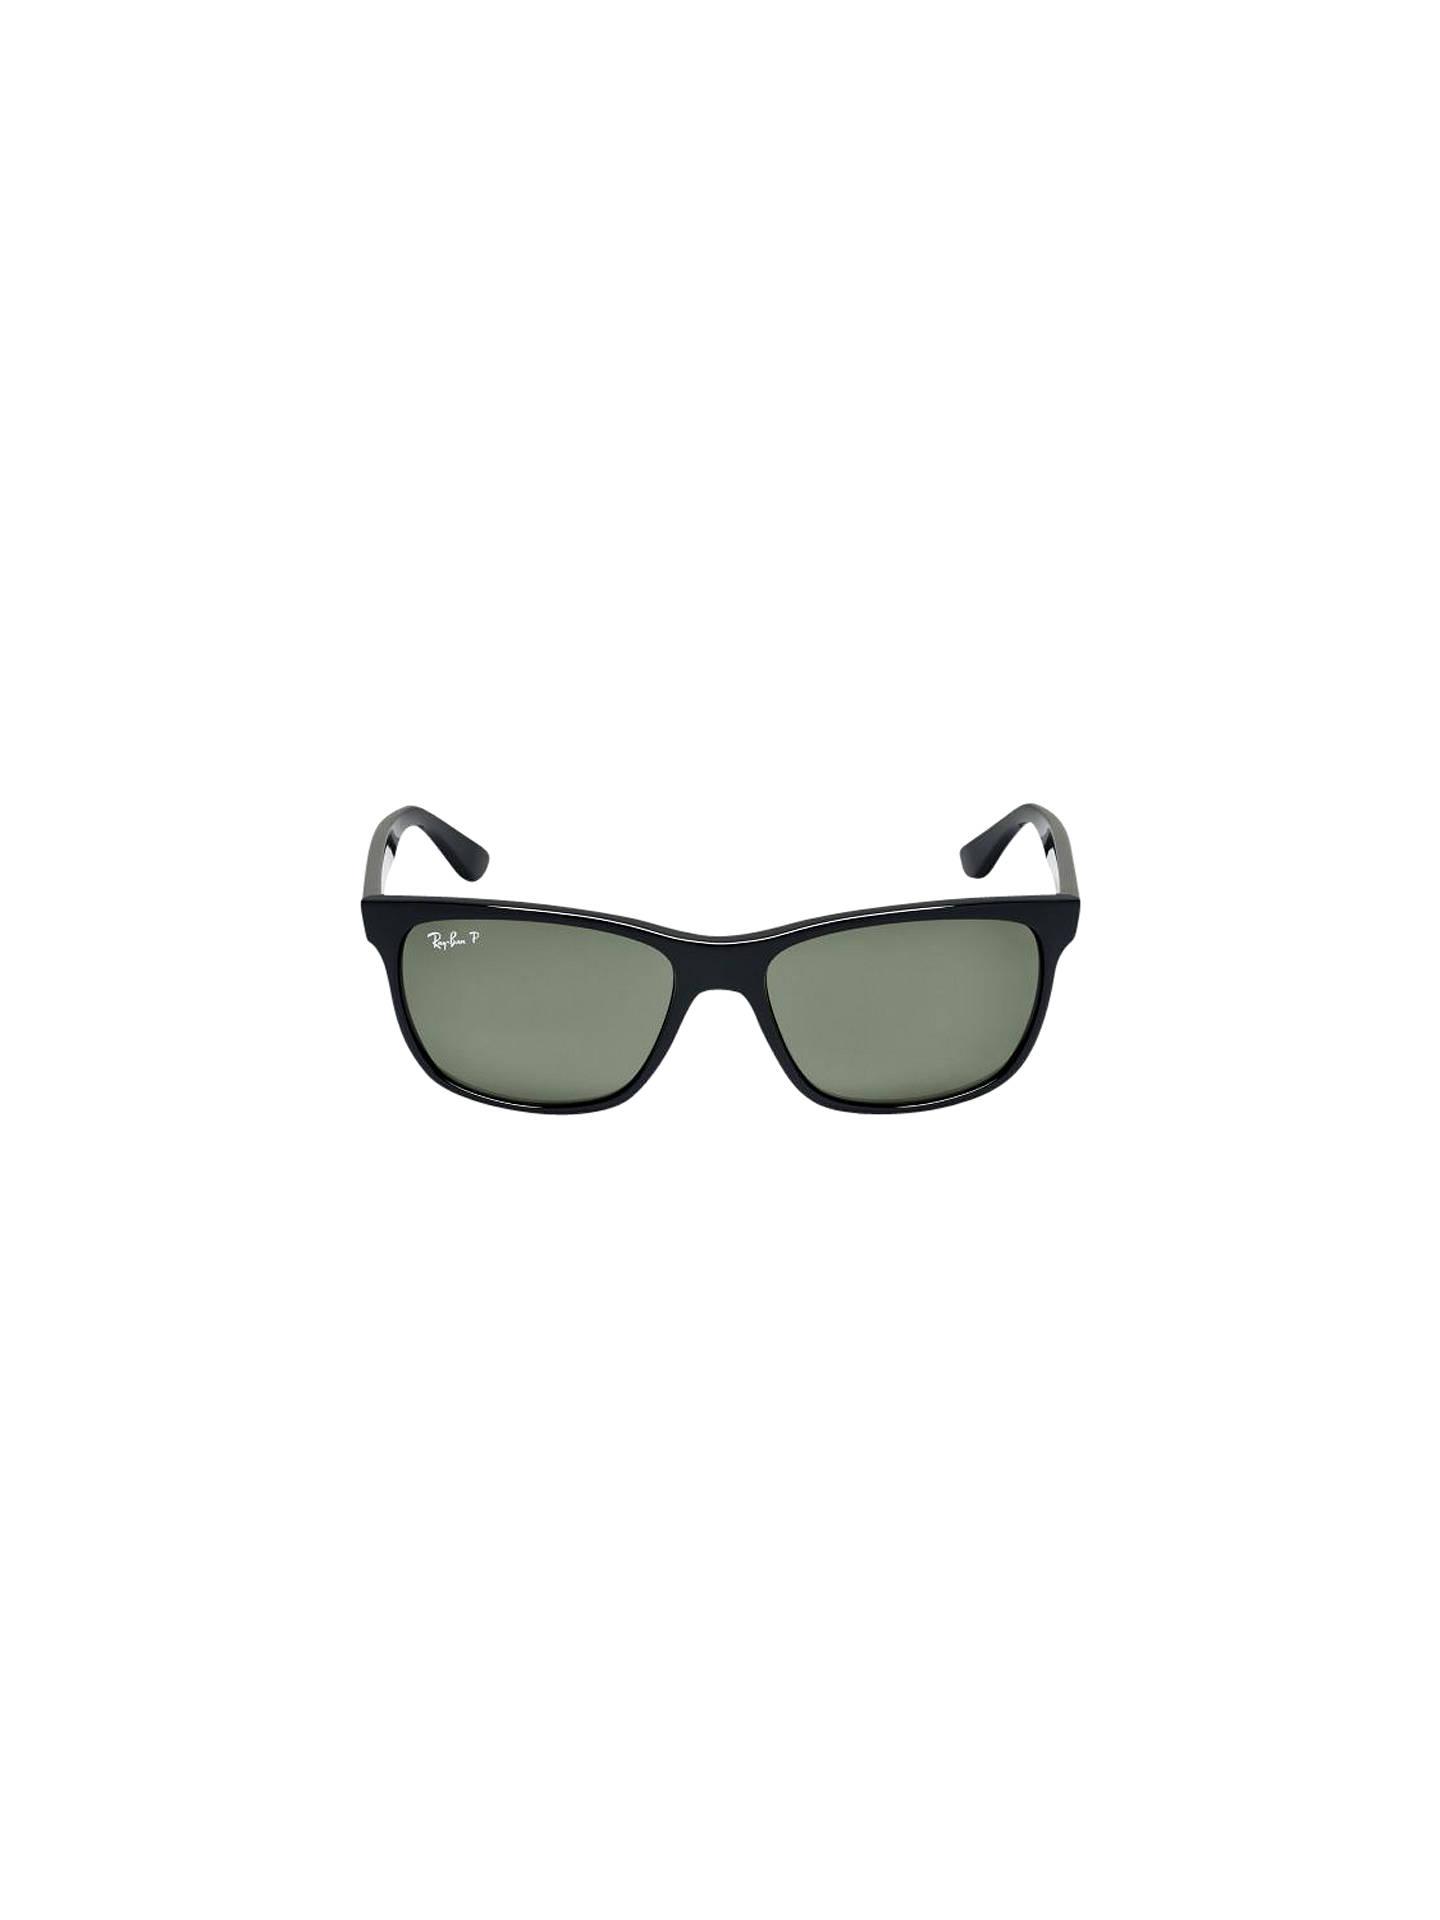 95ef5c94f2 ... Buy Ray-Ban RB4181 Polarised Classic Sunglasses